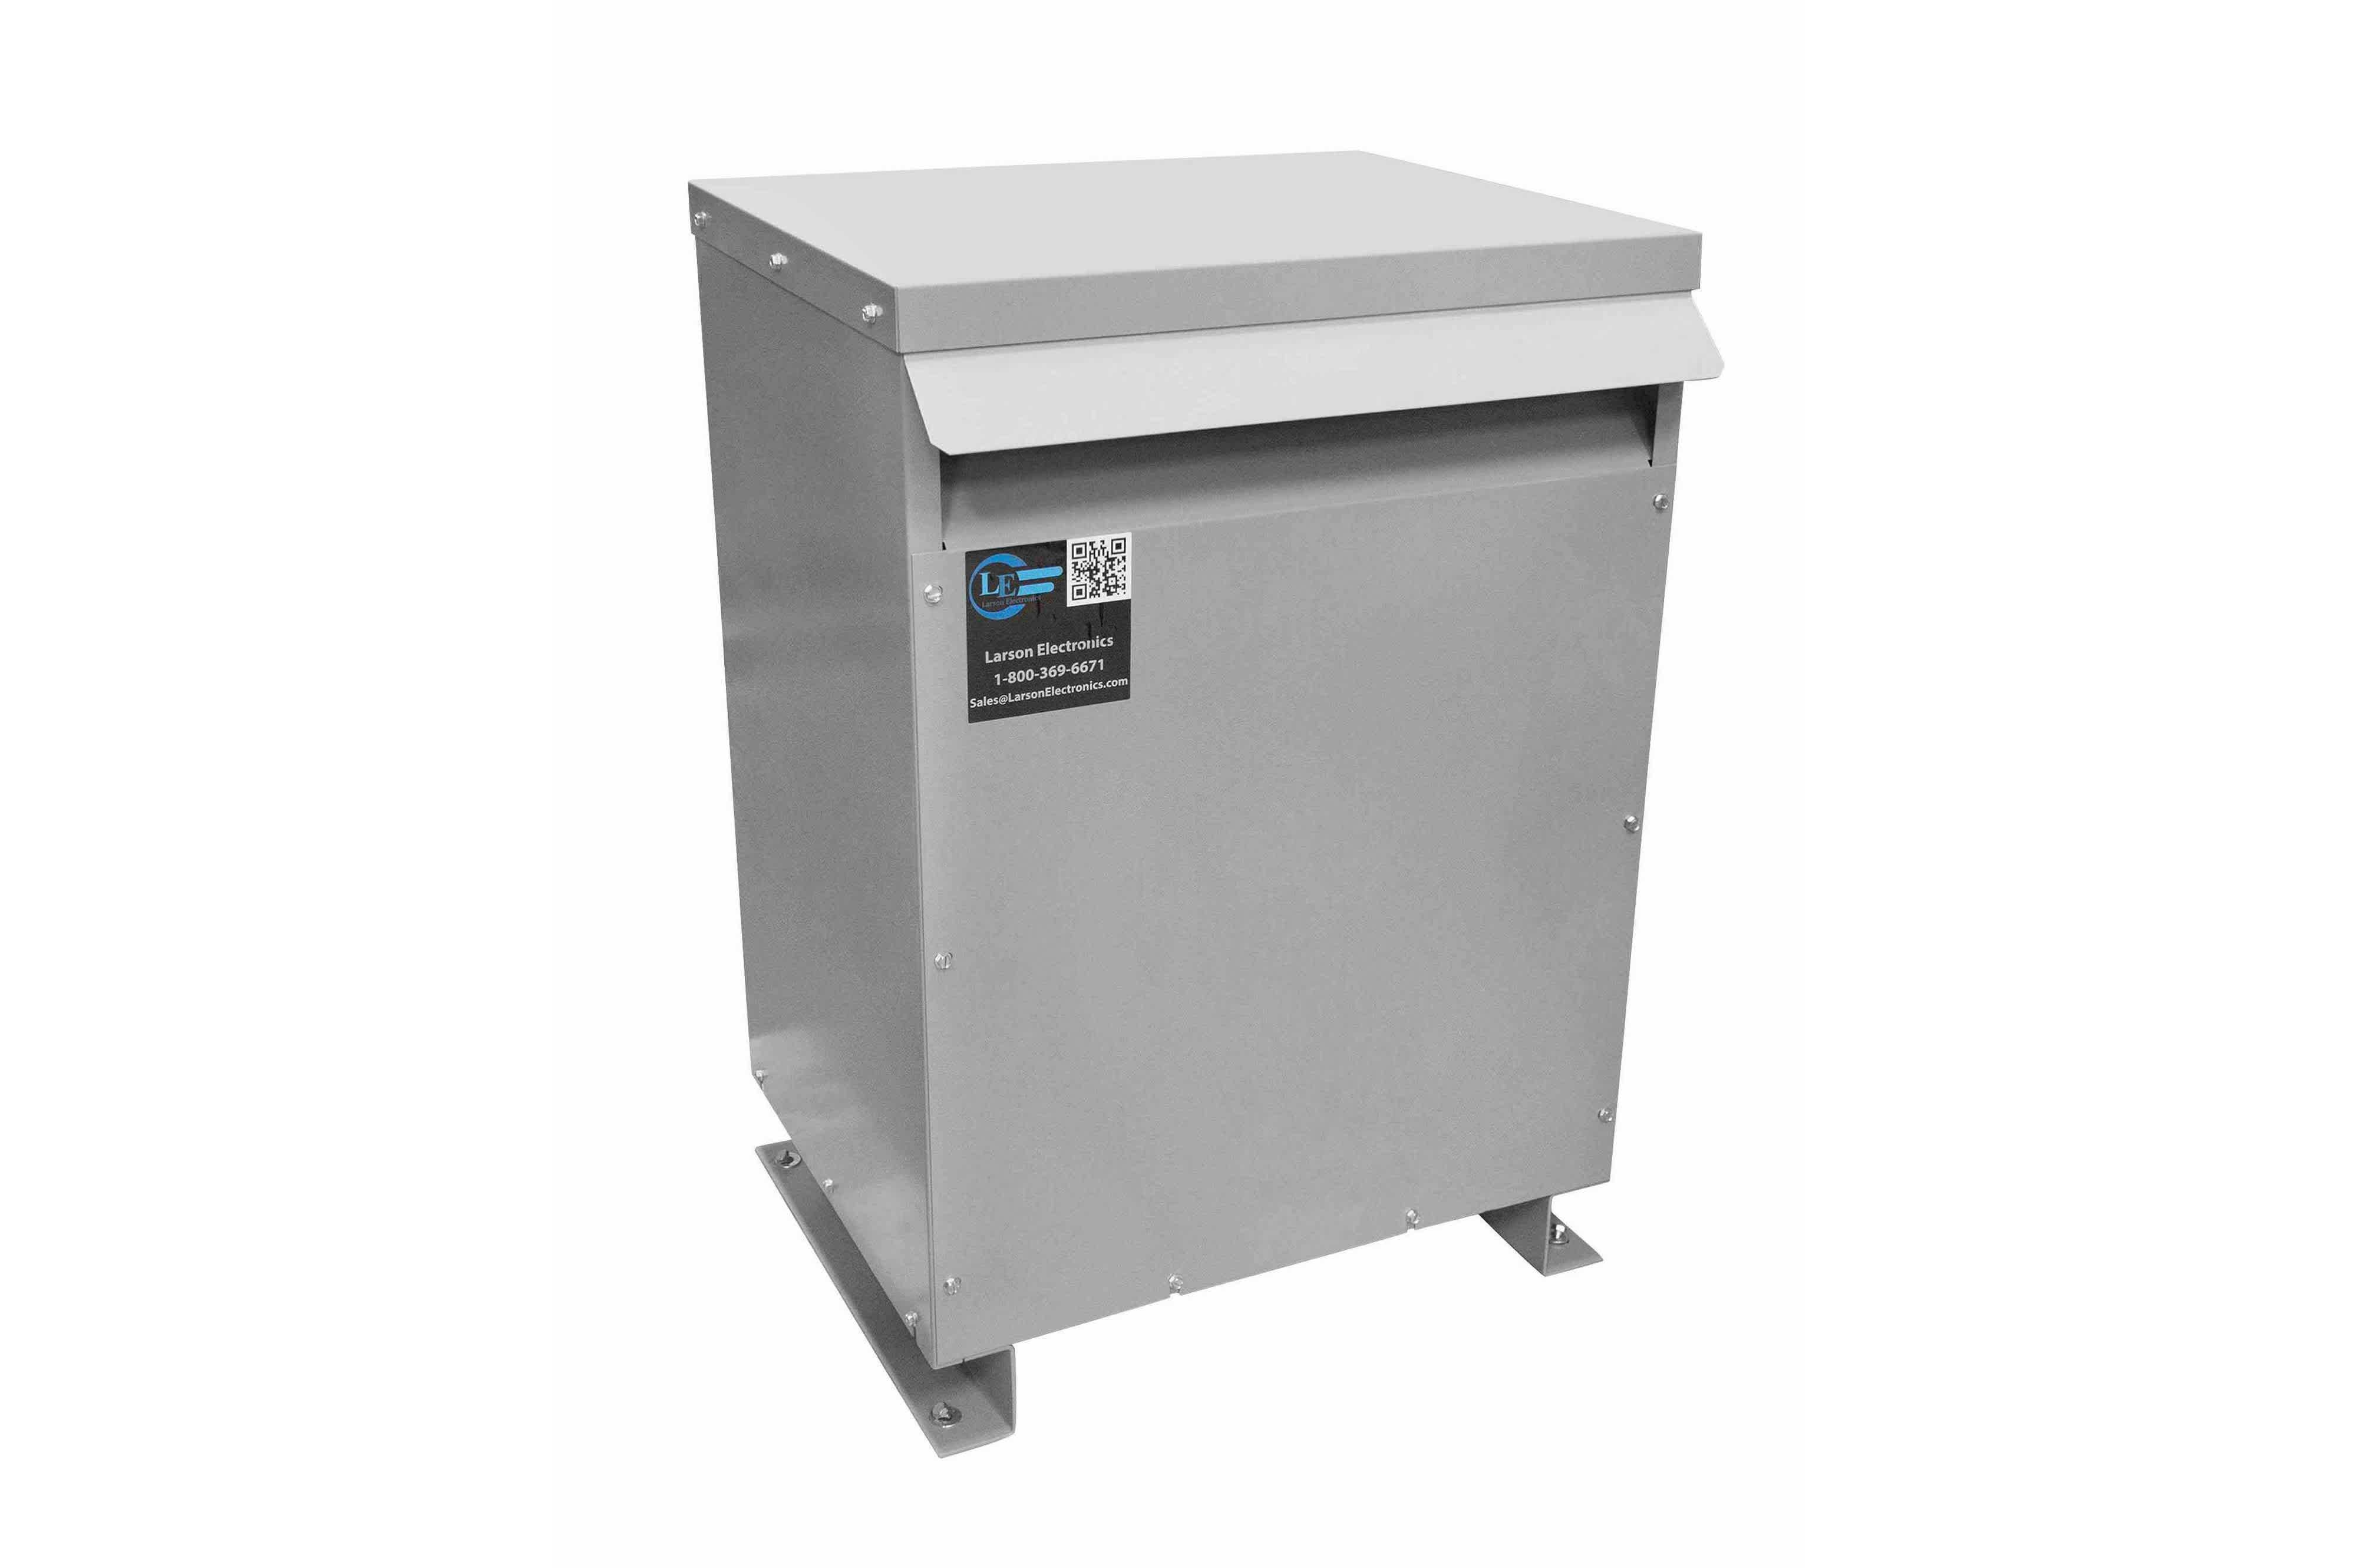 175 kVA 3PH Isolation Transformer, 600V Wye Primary, 480V Delta Secondary, N3R, Ventilated, 60 Hz